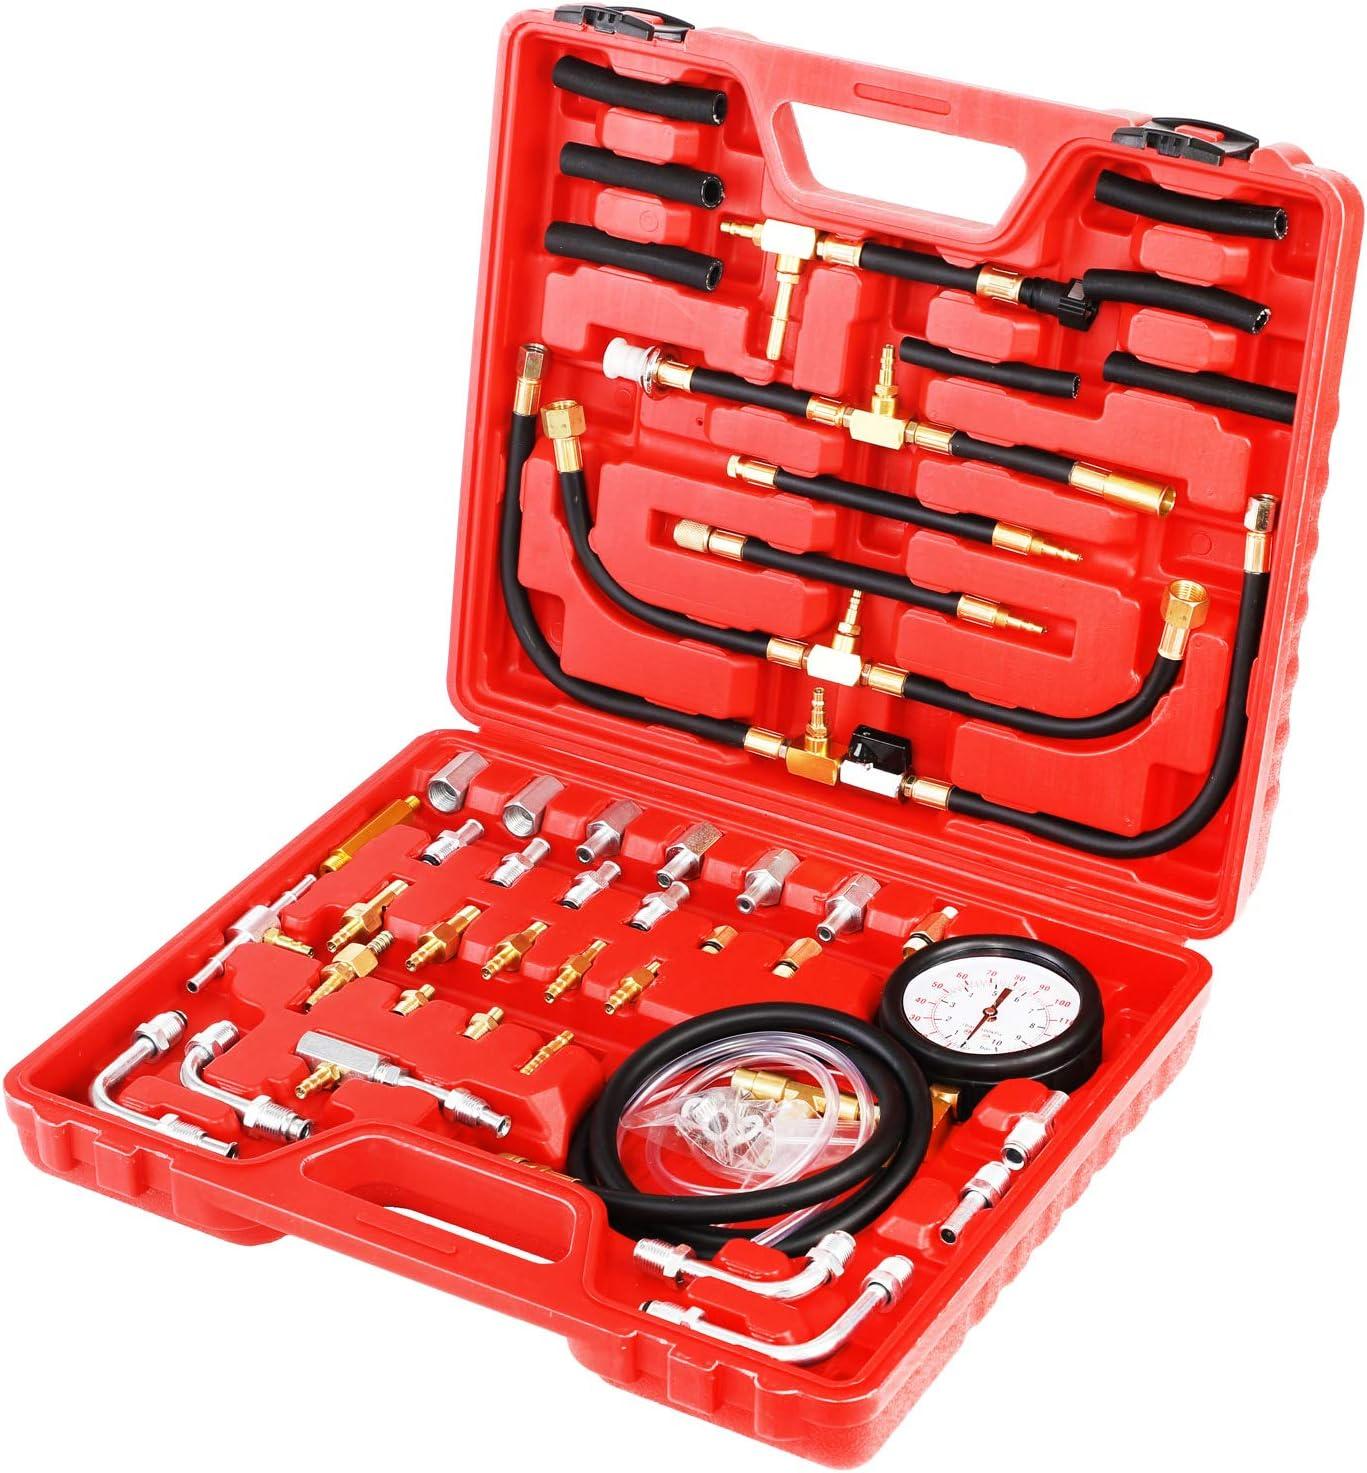 JIFETOR Latest item Fuel Injection Pump Pressure Gasol Lowest price challenge Gauge Tester Kit Car